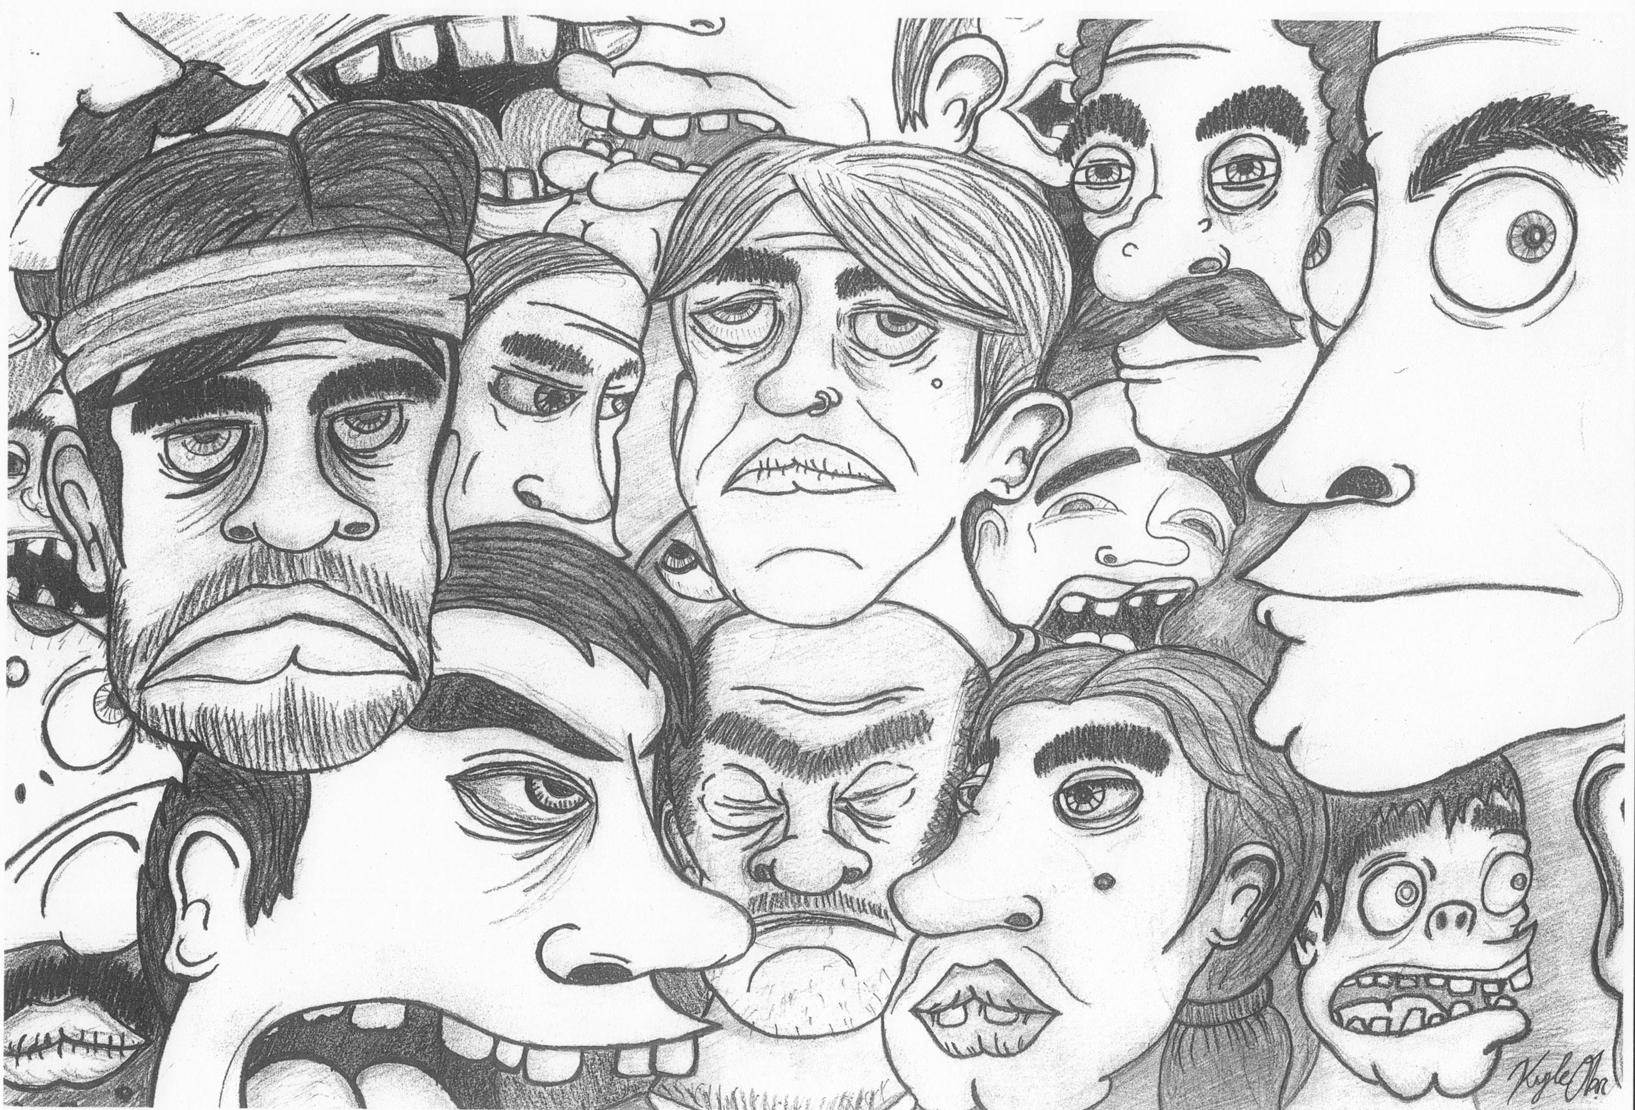 Faces of Those I Don't Like